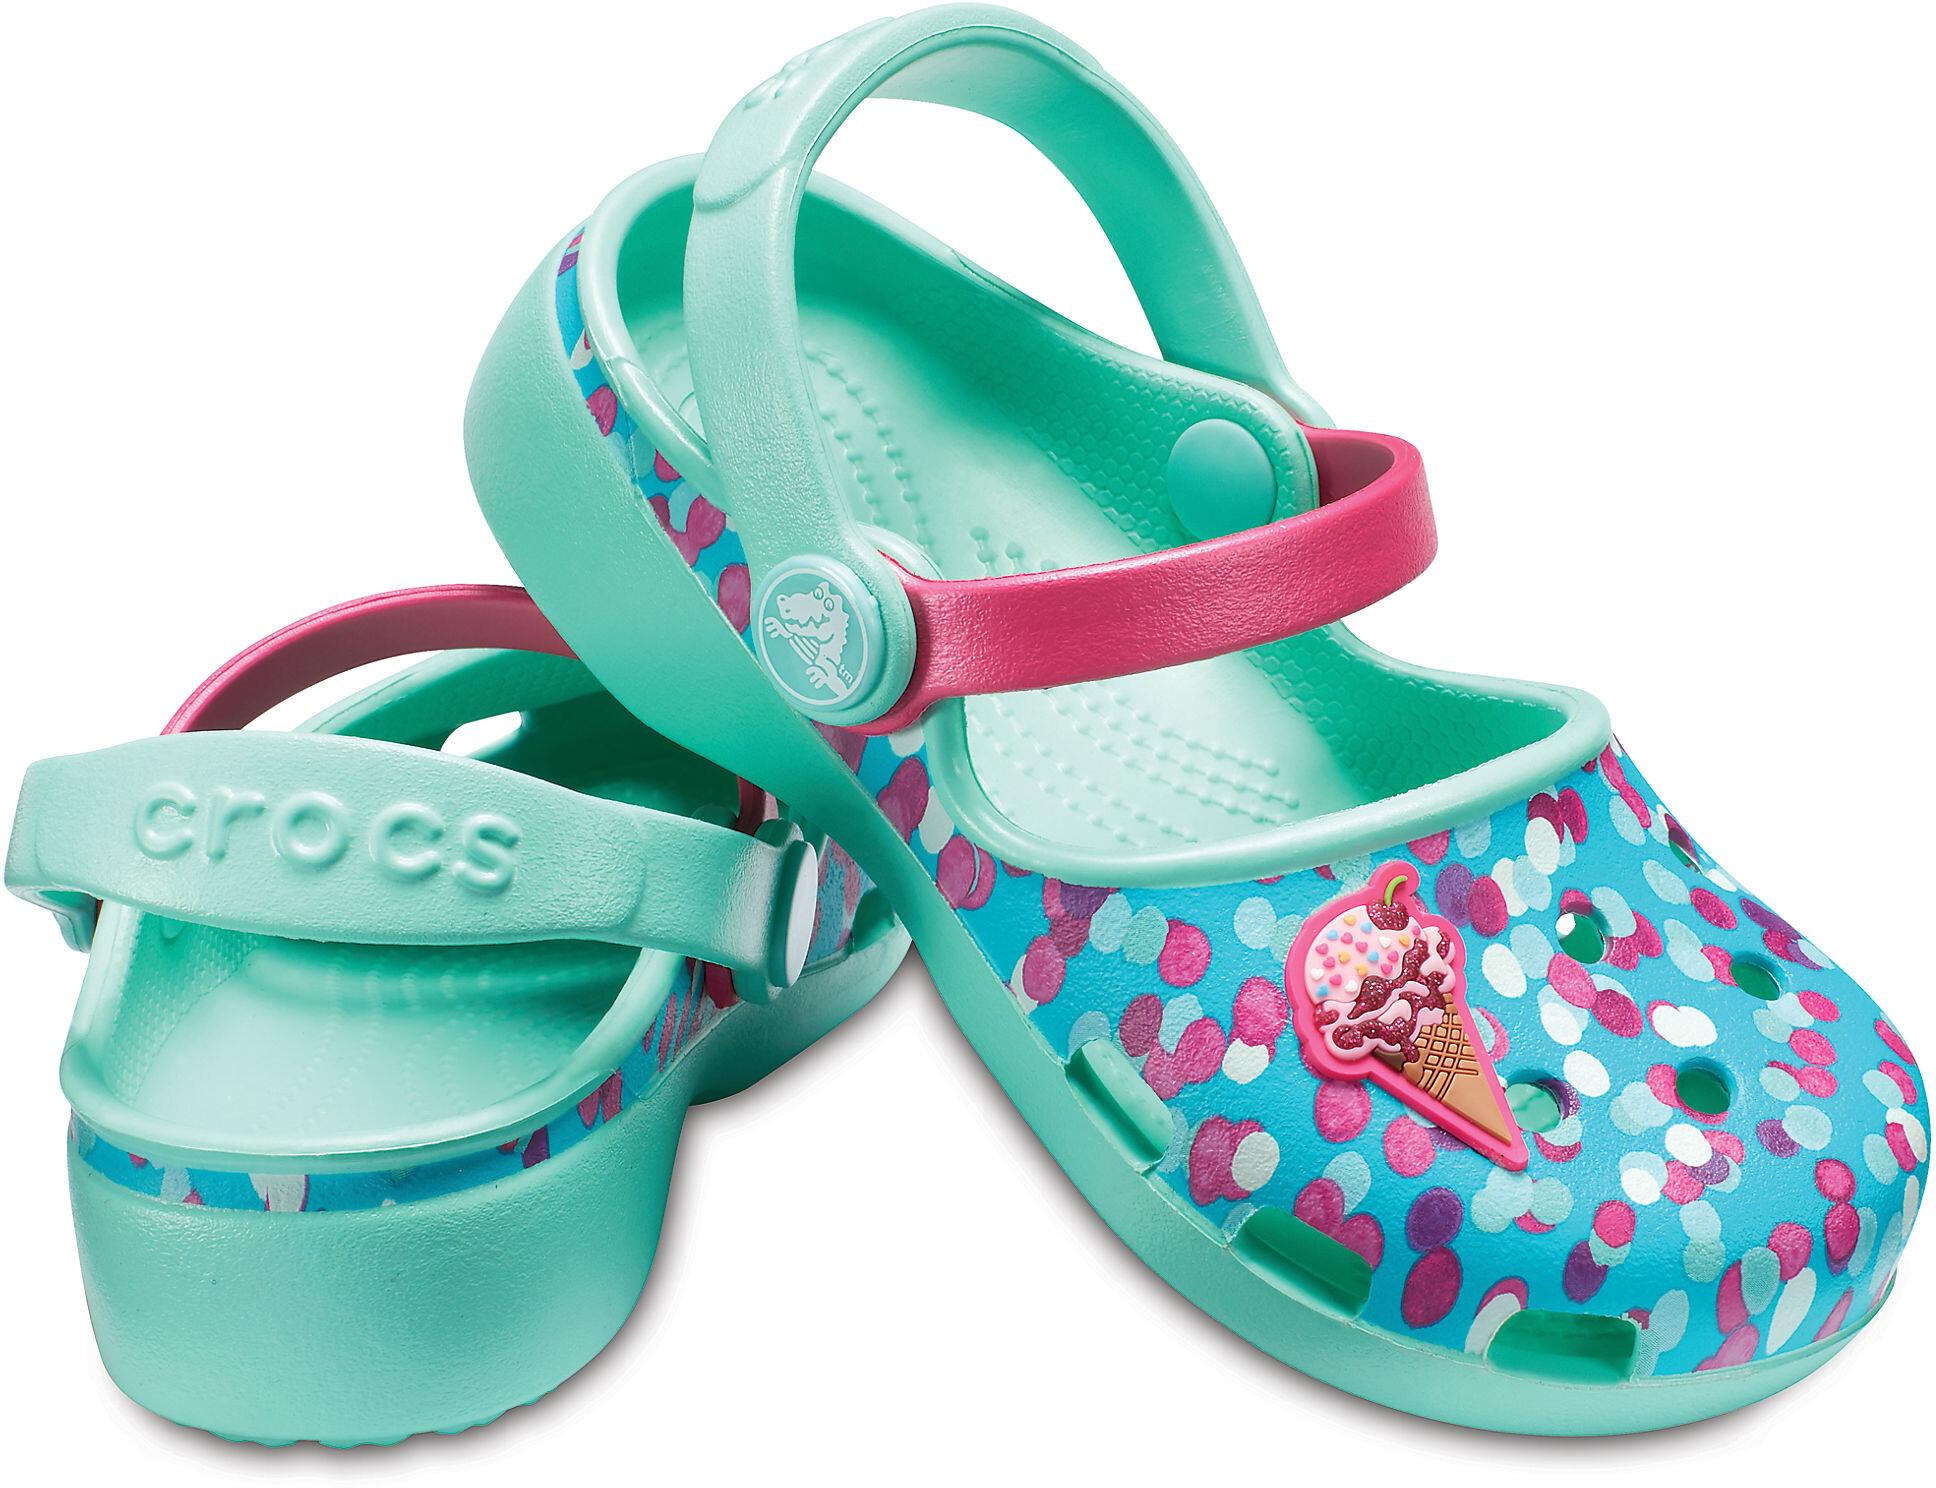 ceb03b1f6d37 Crocs Karin Novelty Sandals Children pink turquoise at Addnature.co.uk